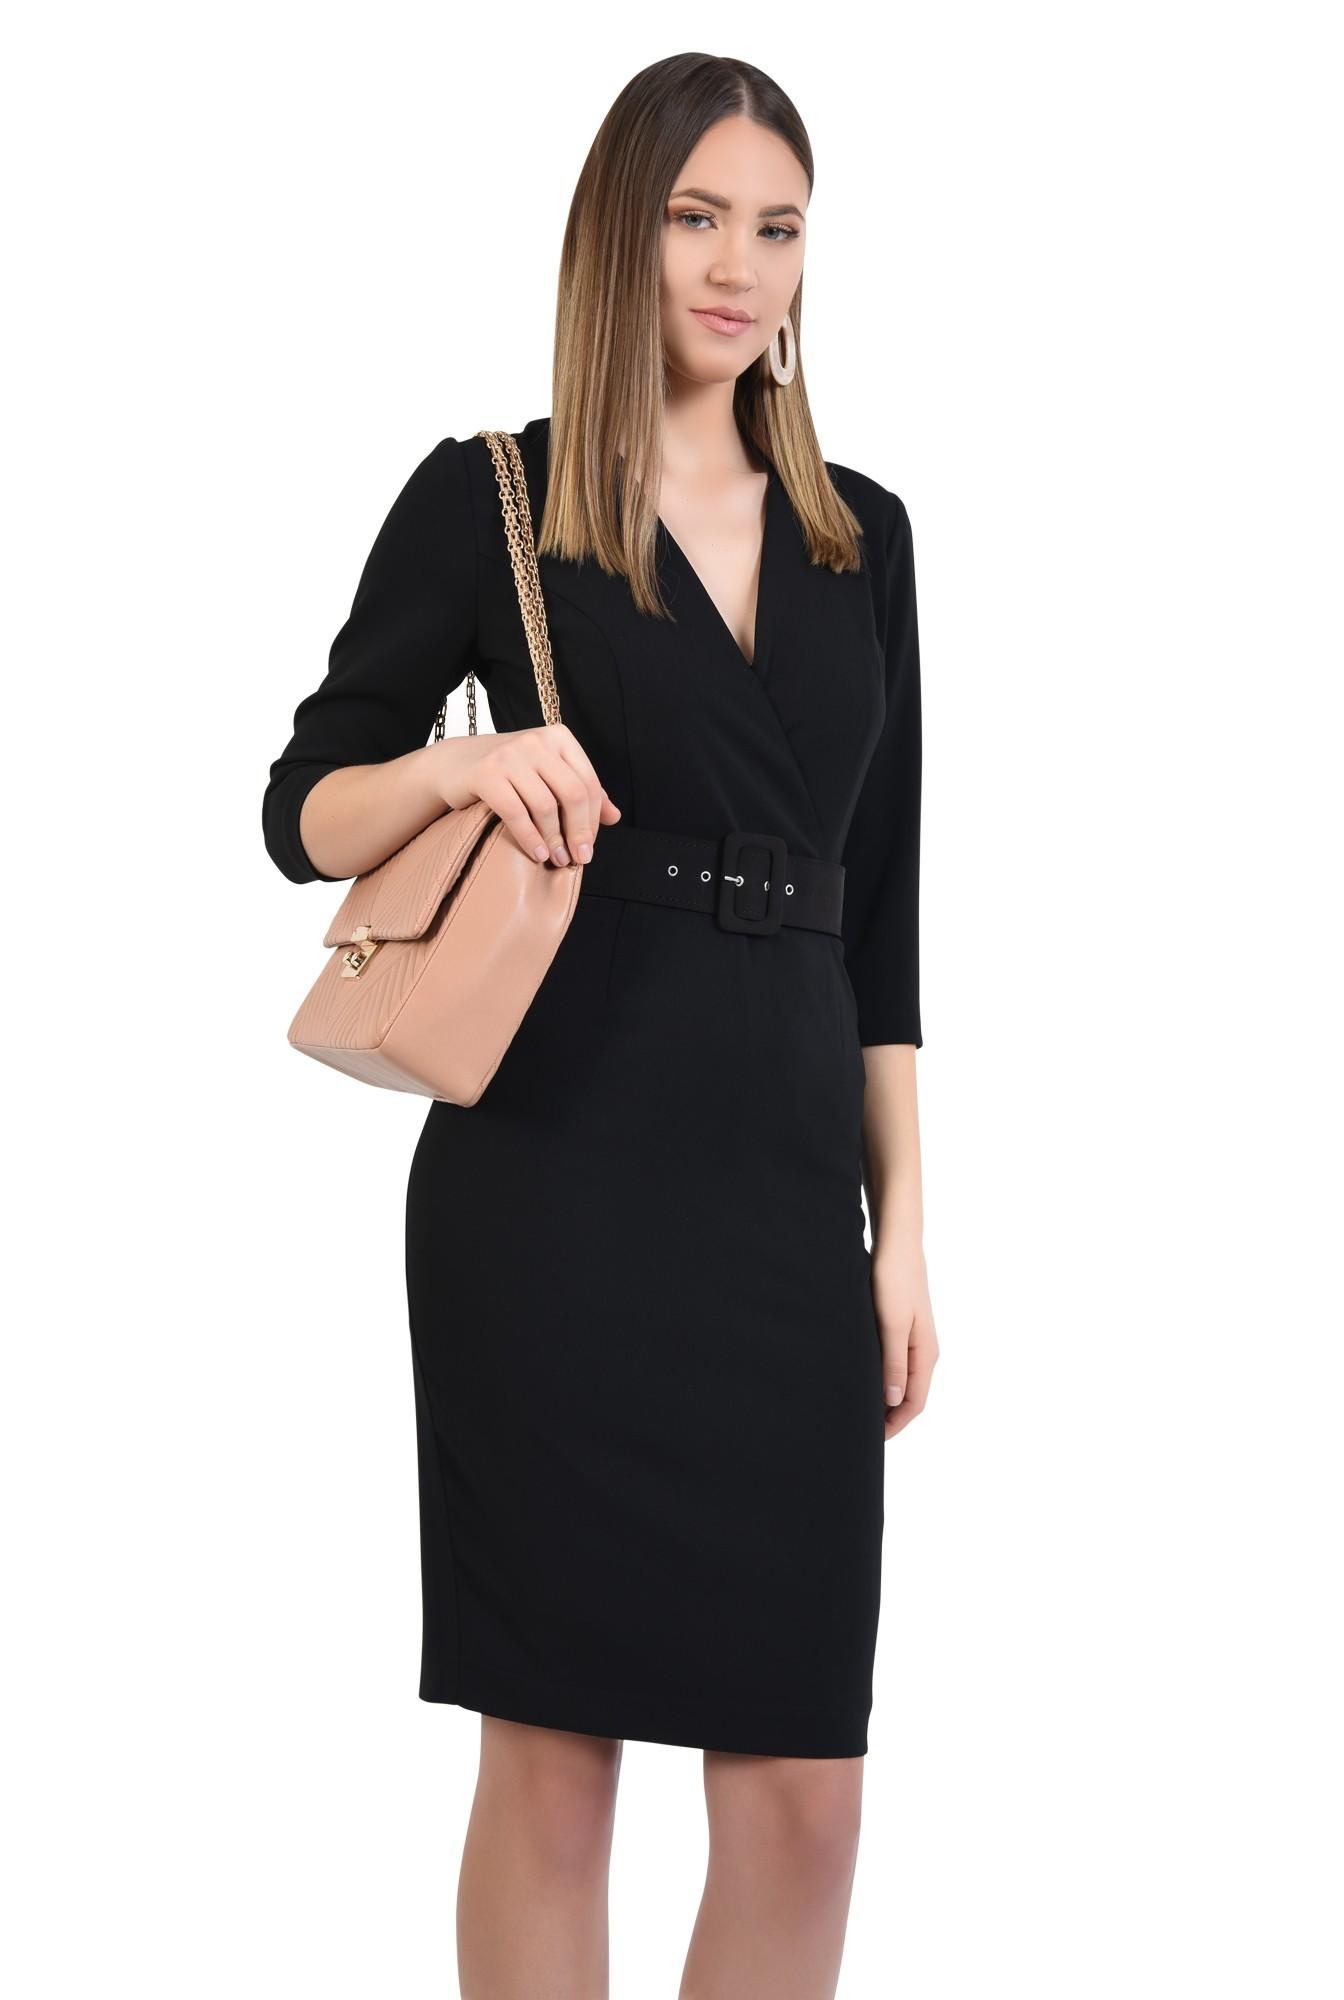 0 - rochie neagra, office, conica, cu centura